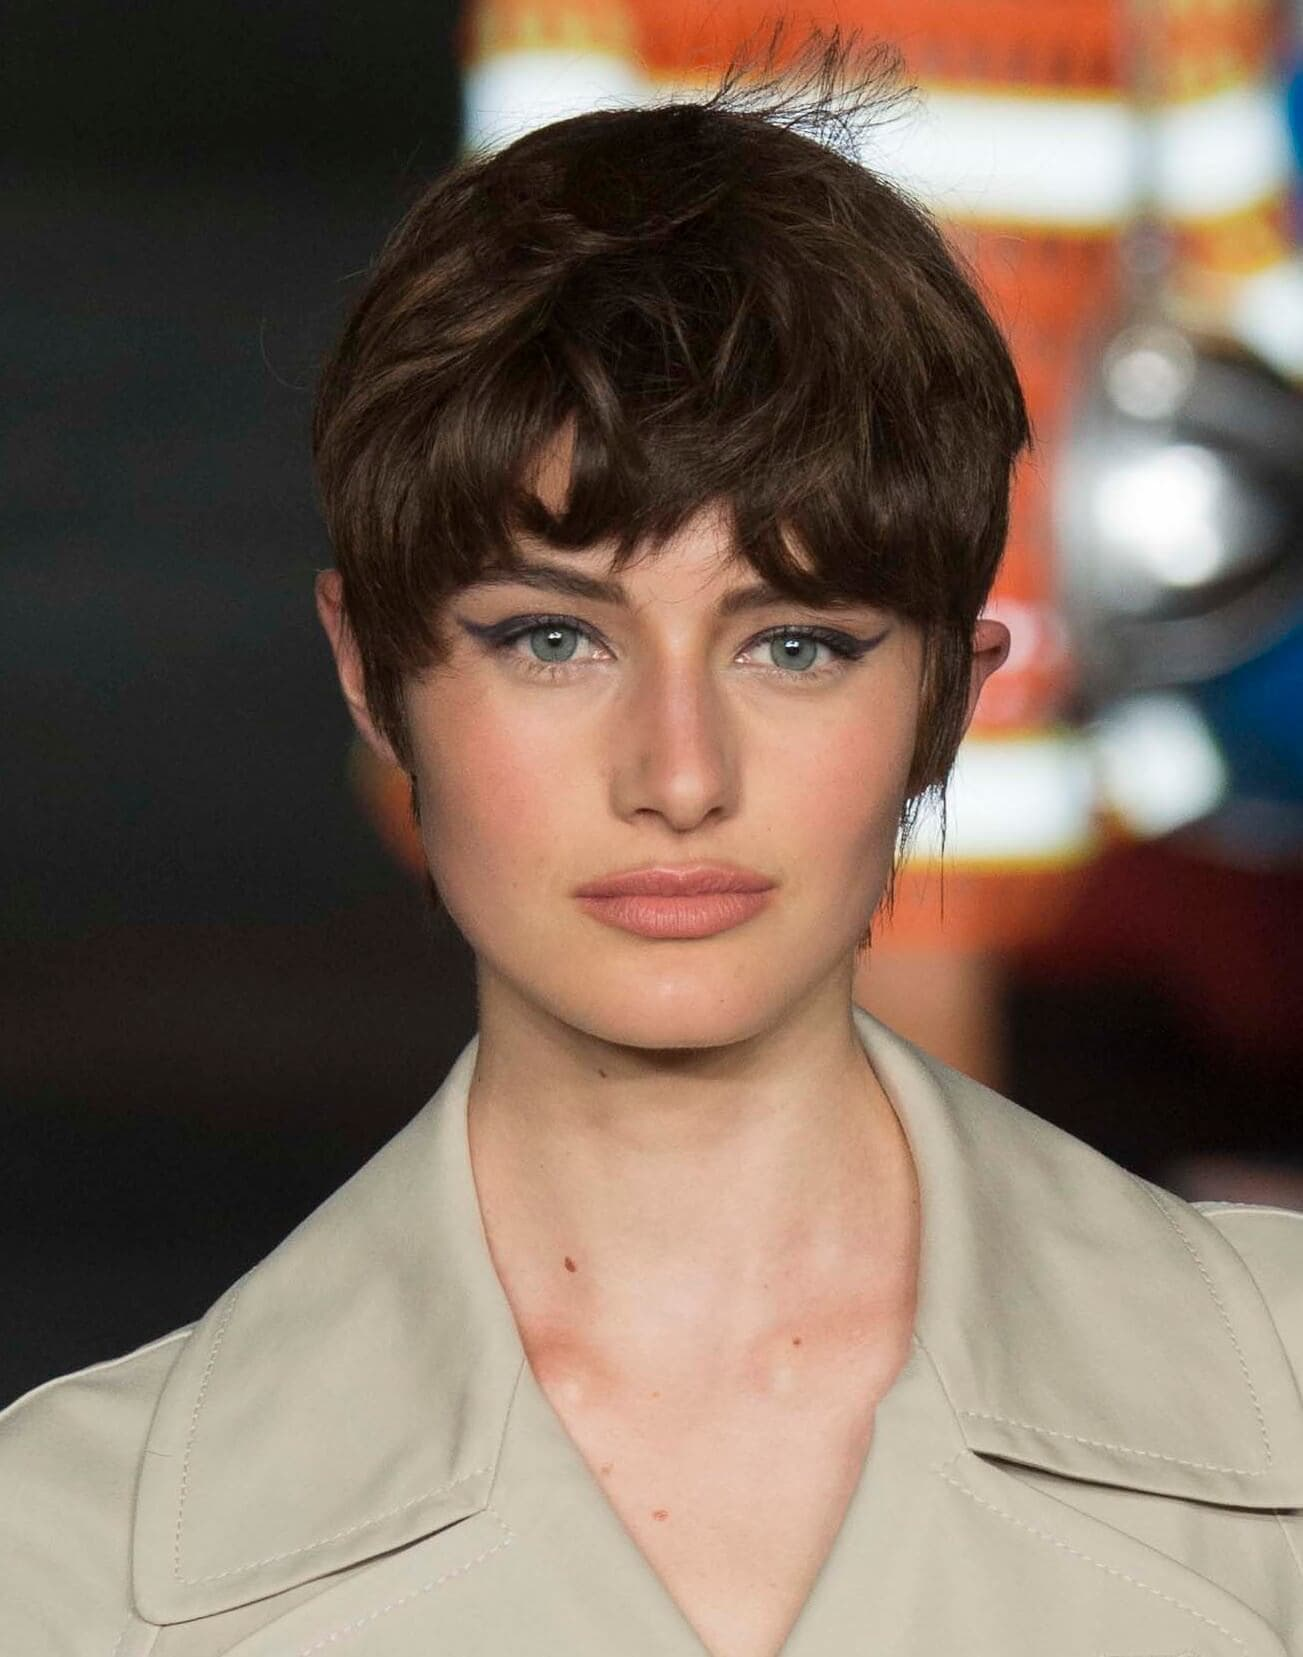 Dark pixie hairstyles for round faces